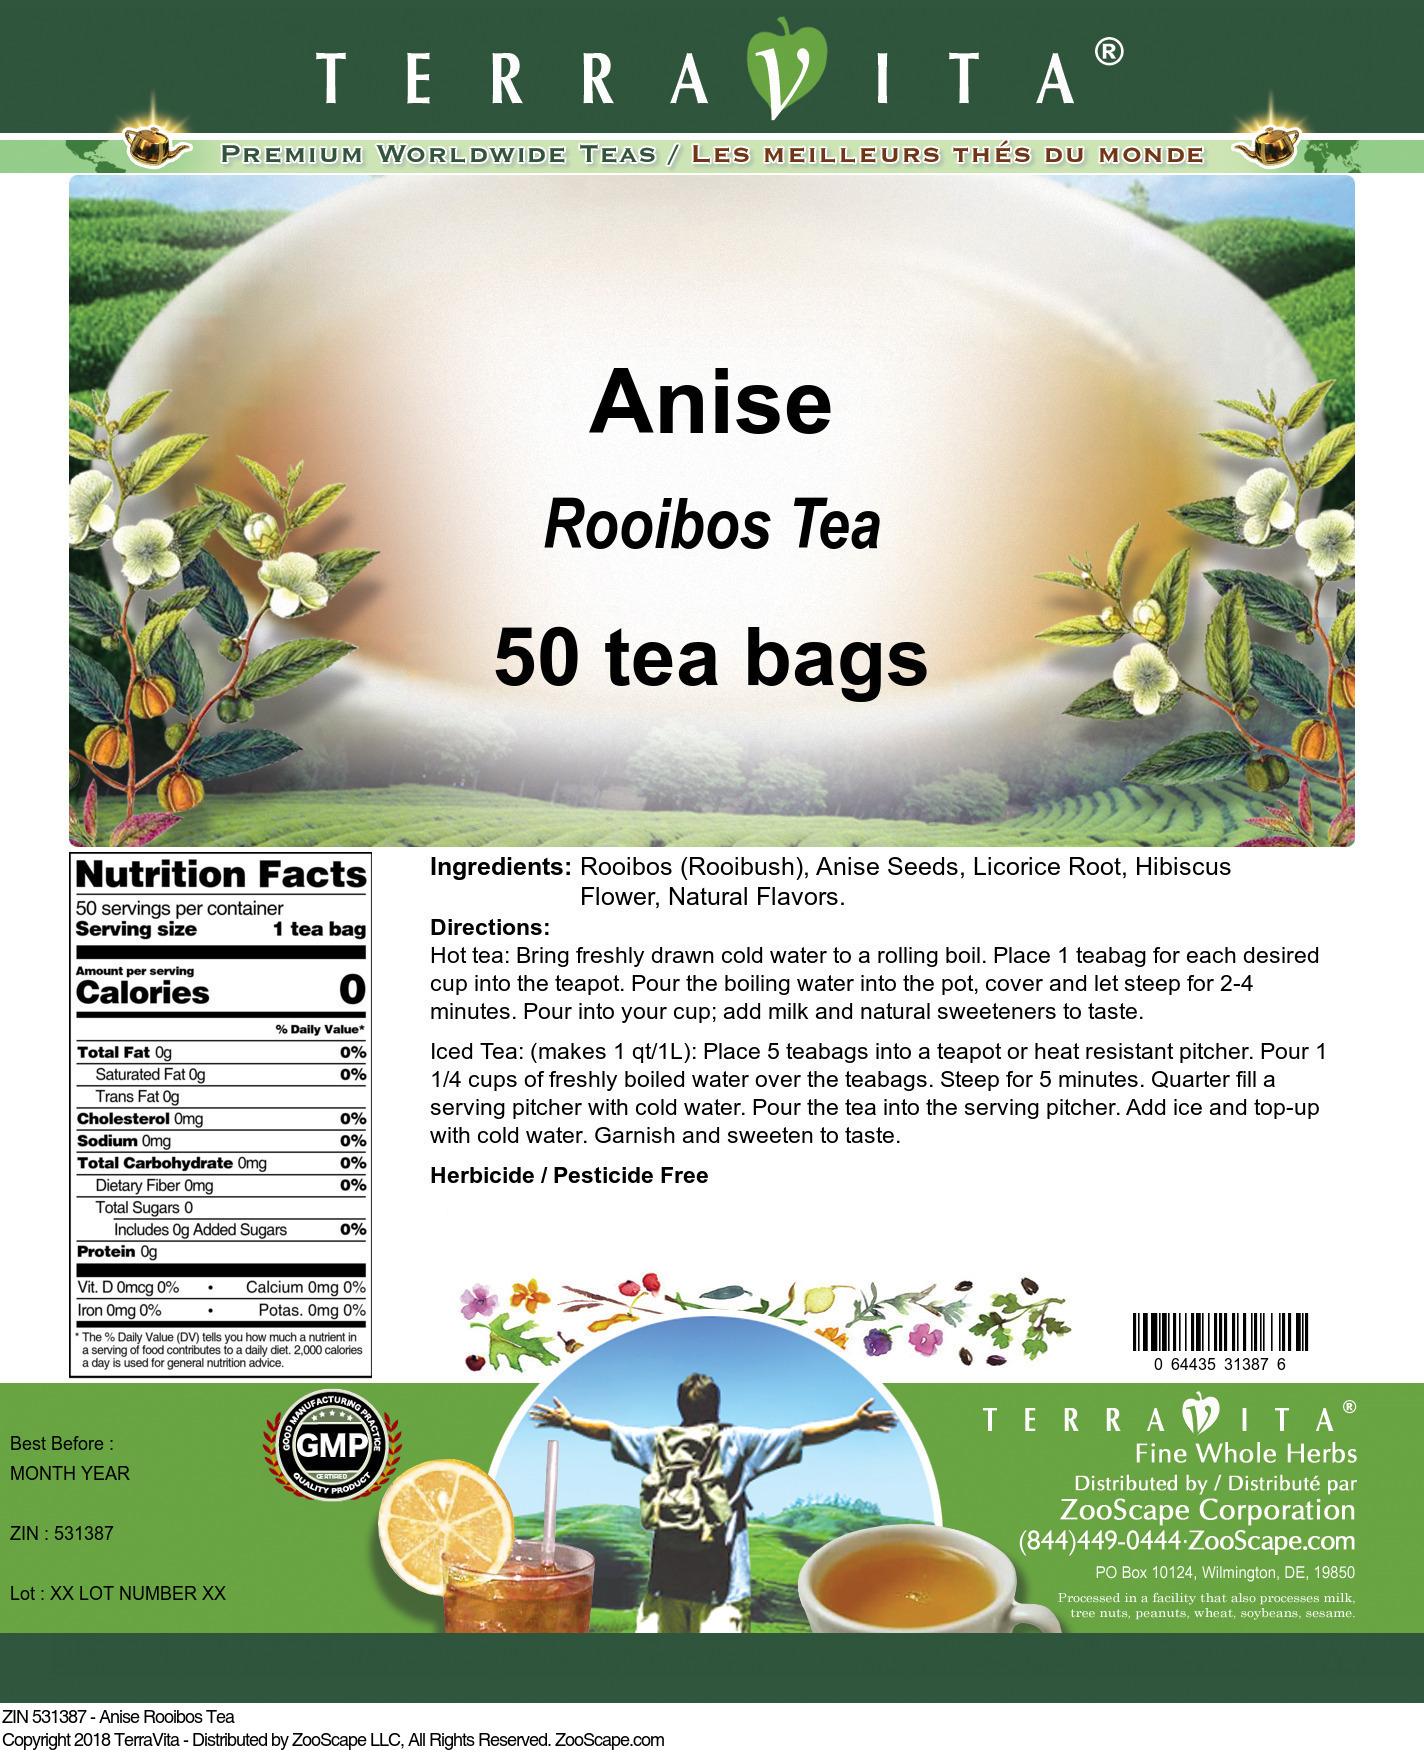 Anise Rooibos Tea